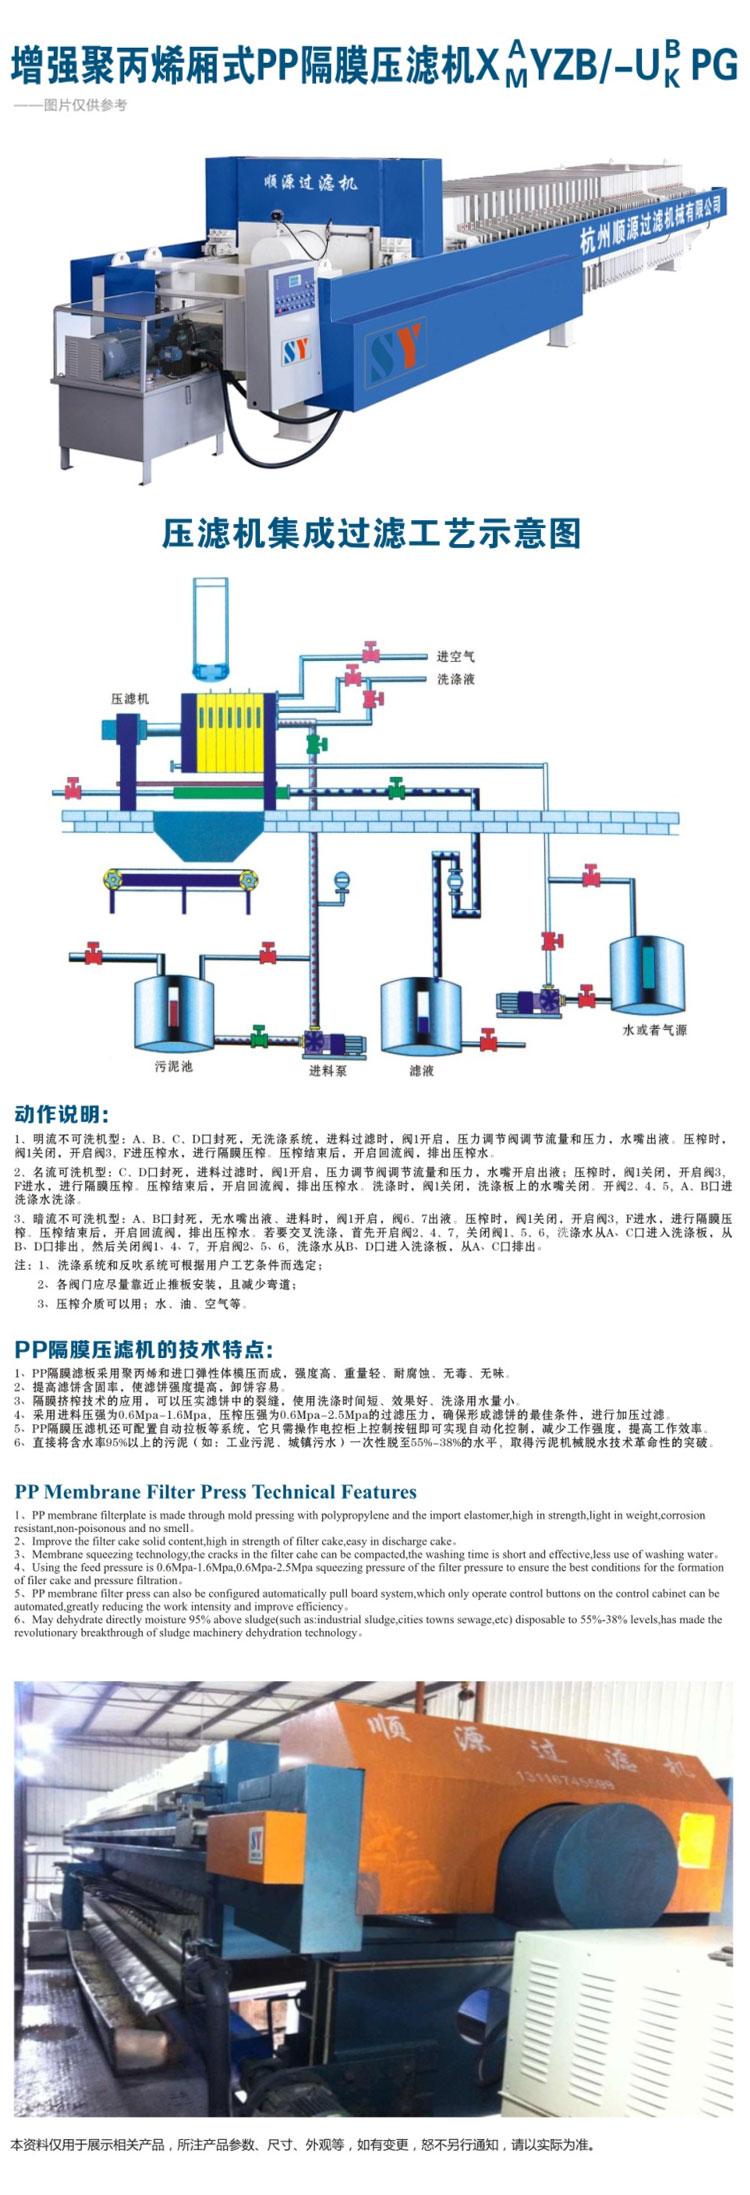 PP隔膜压滤机1-02.jpg